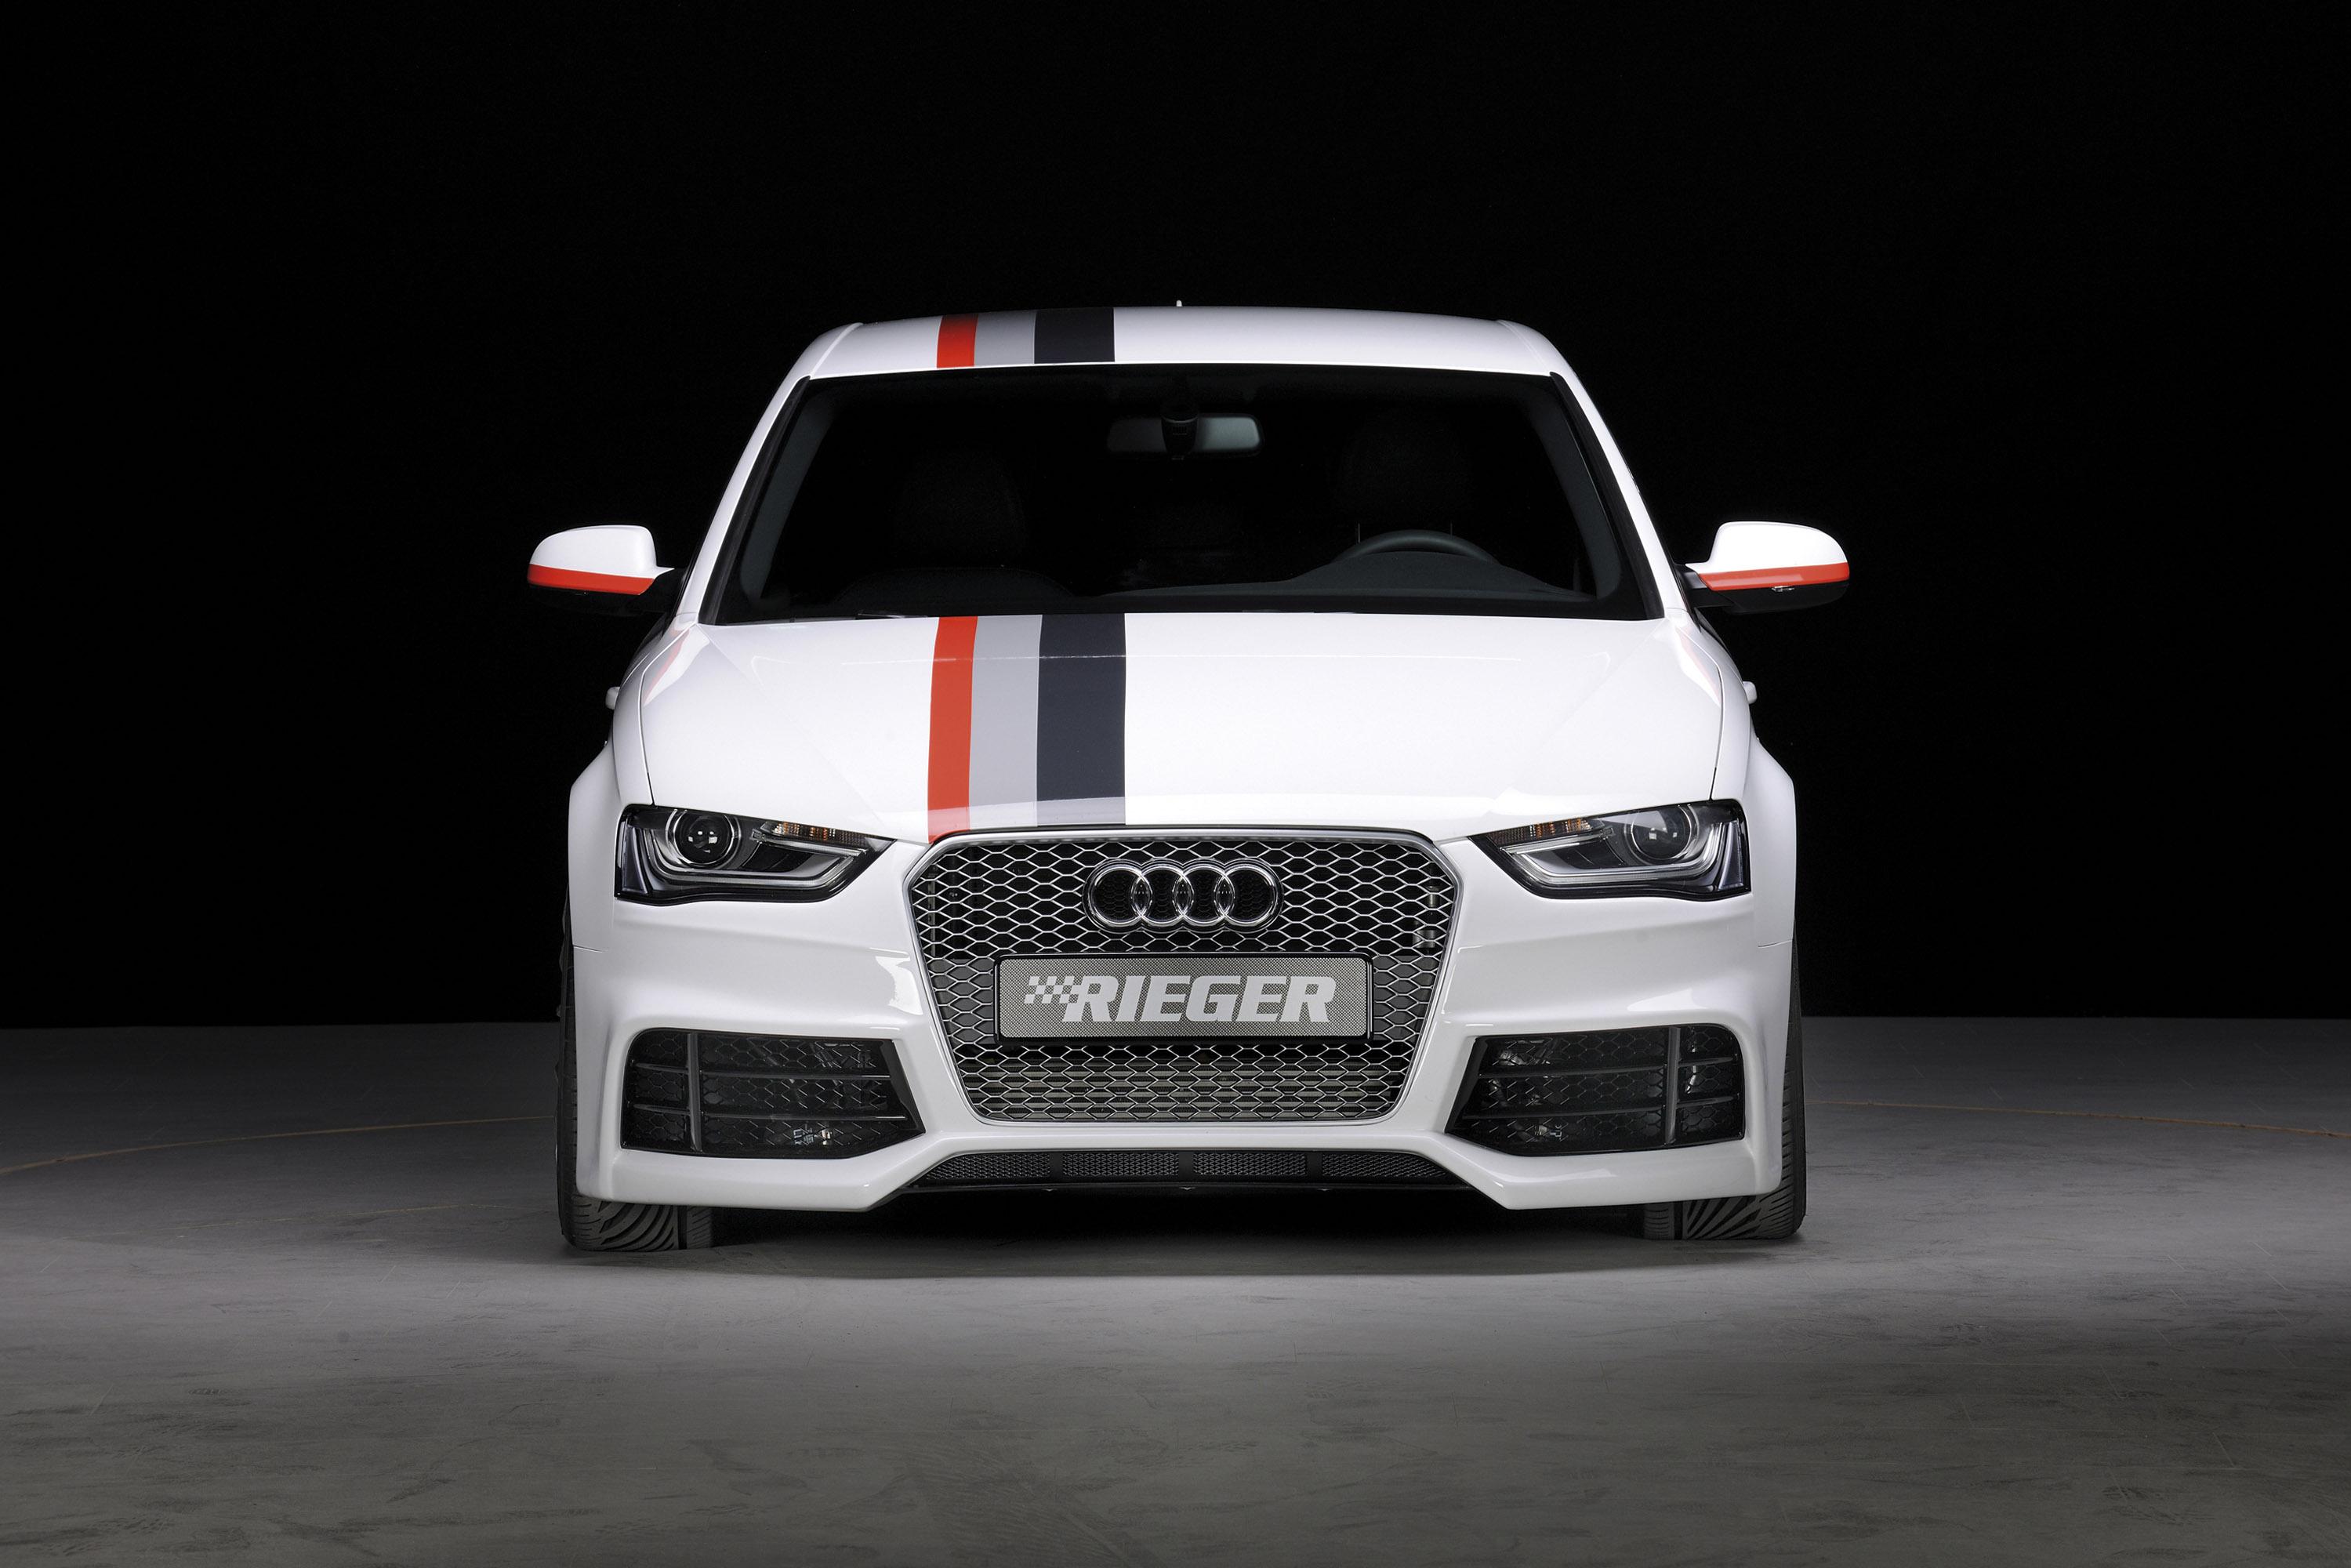 2013 Rieger Audi A4 B8 Facelift Picture 80690